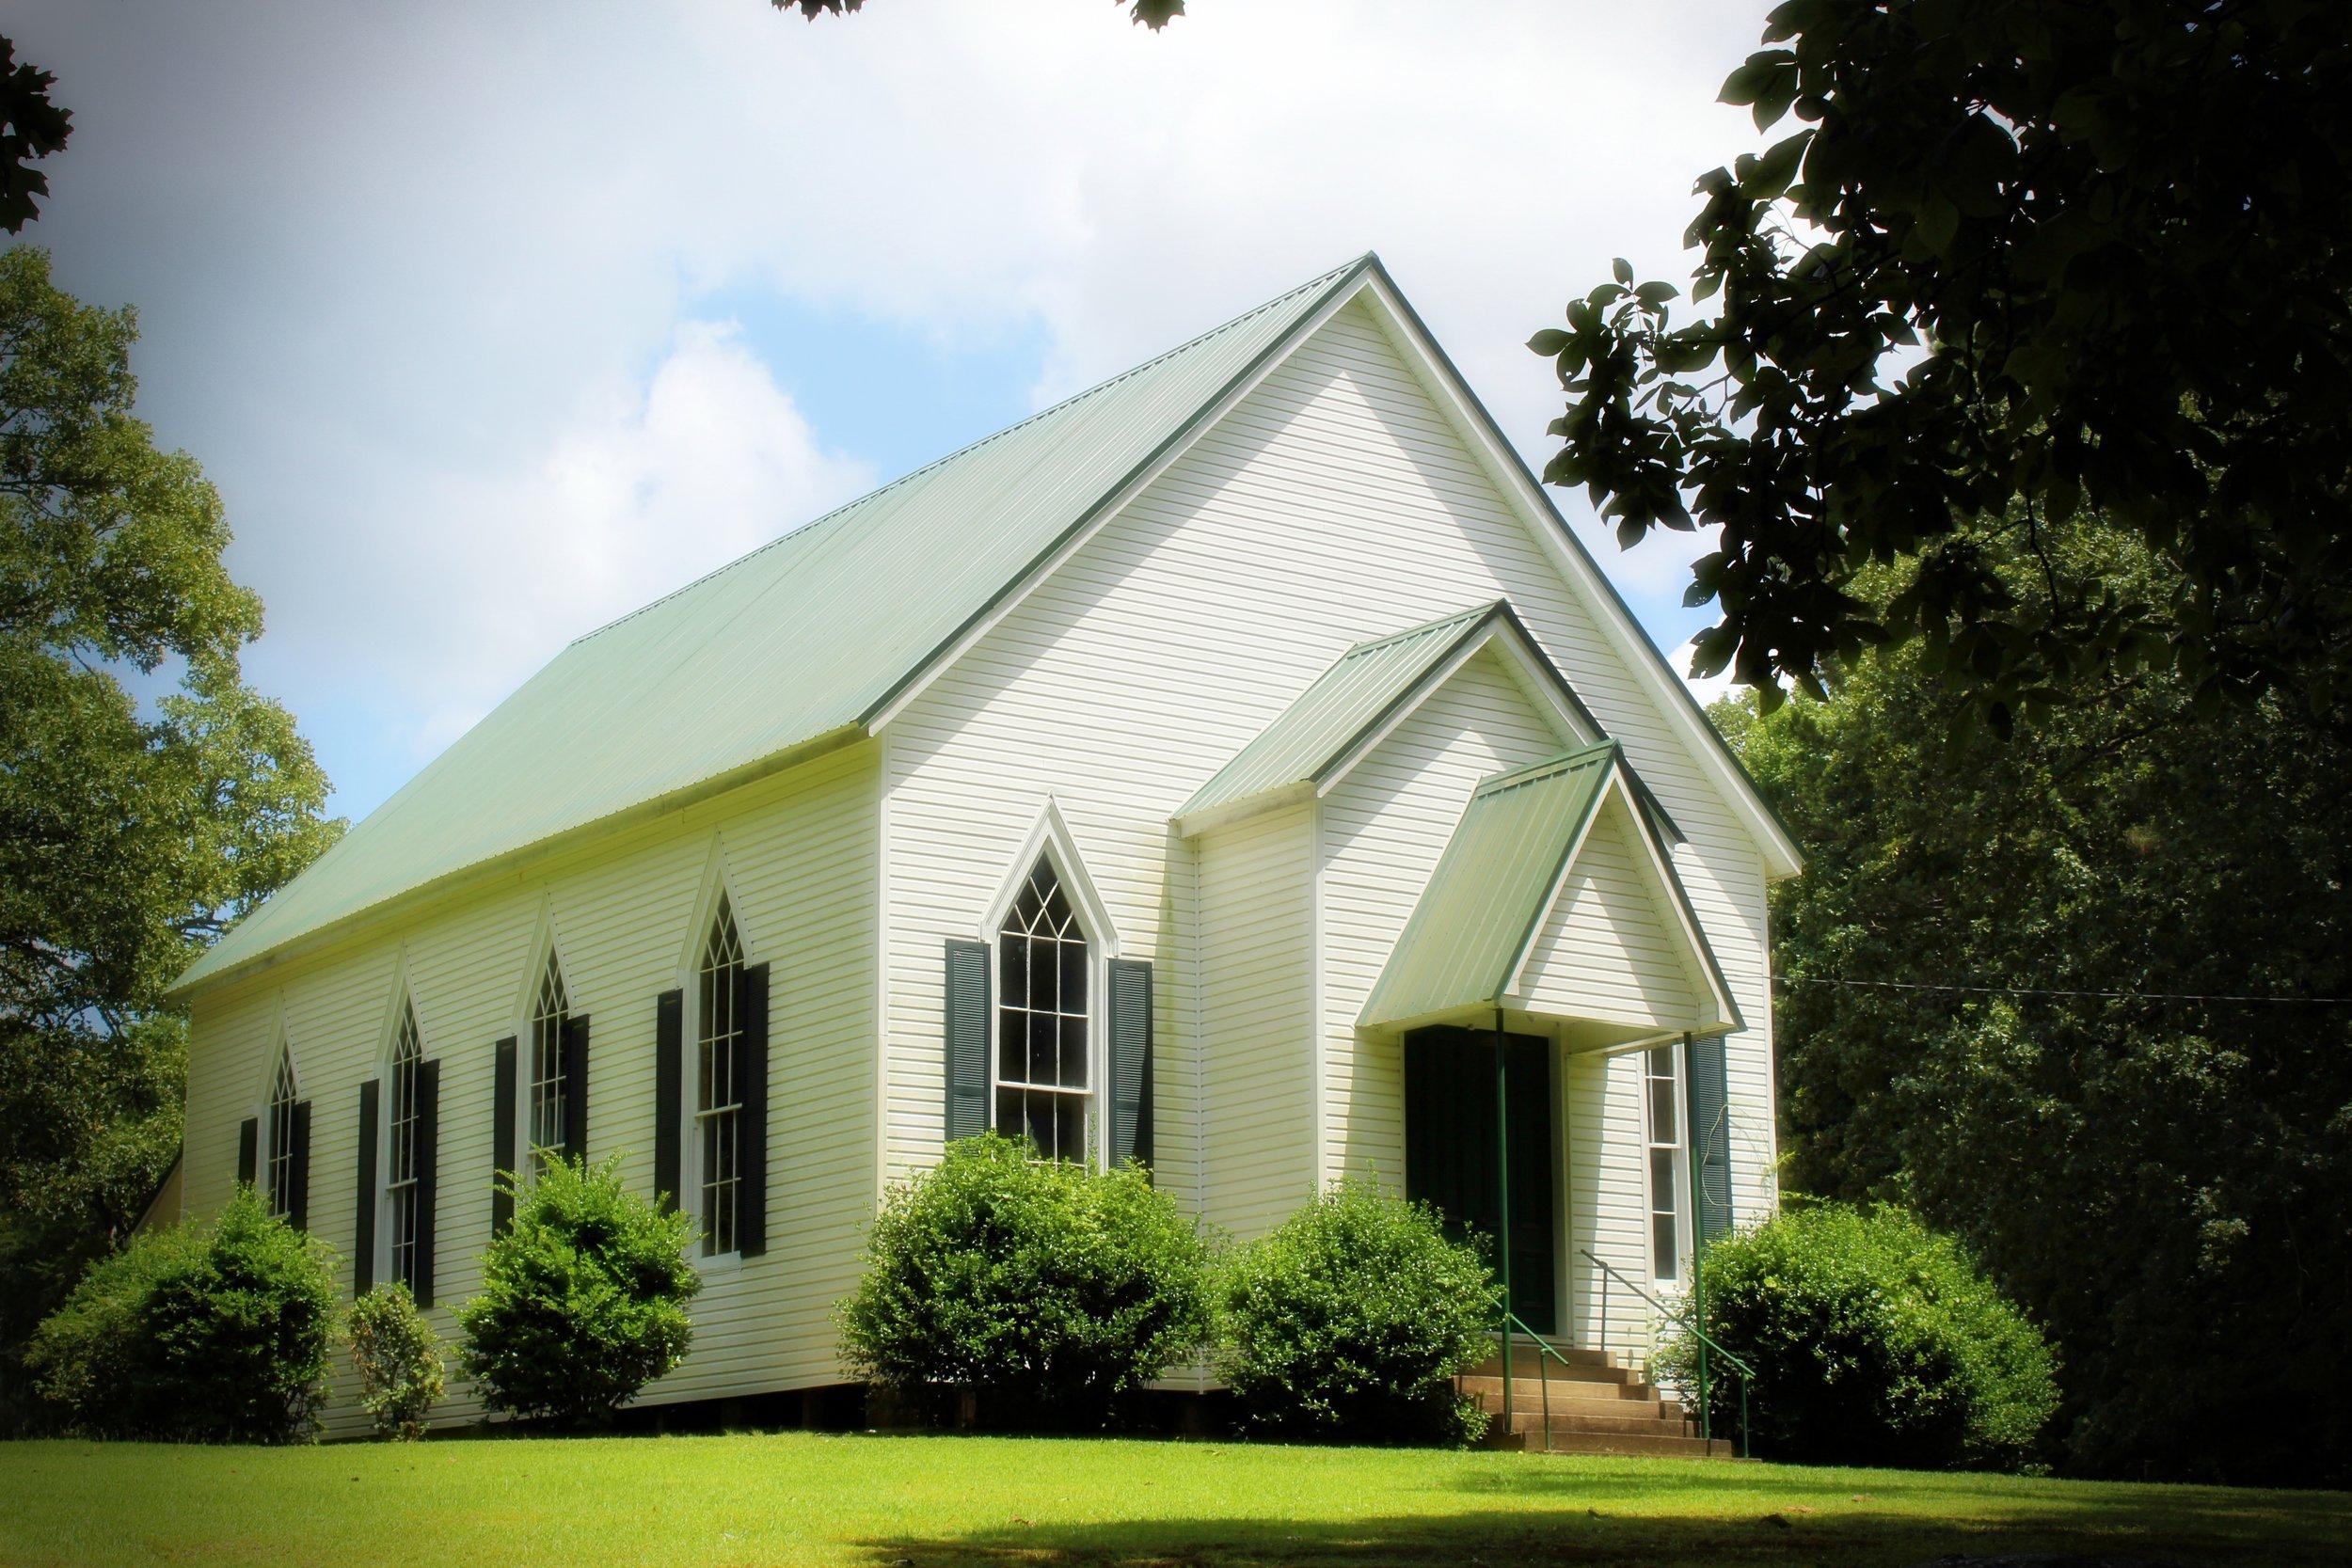 Bethel Methodist Church, Attala County, Miss., built post-Civil War